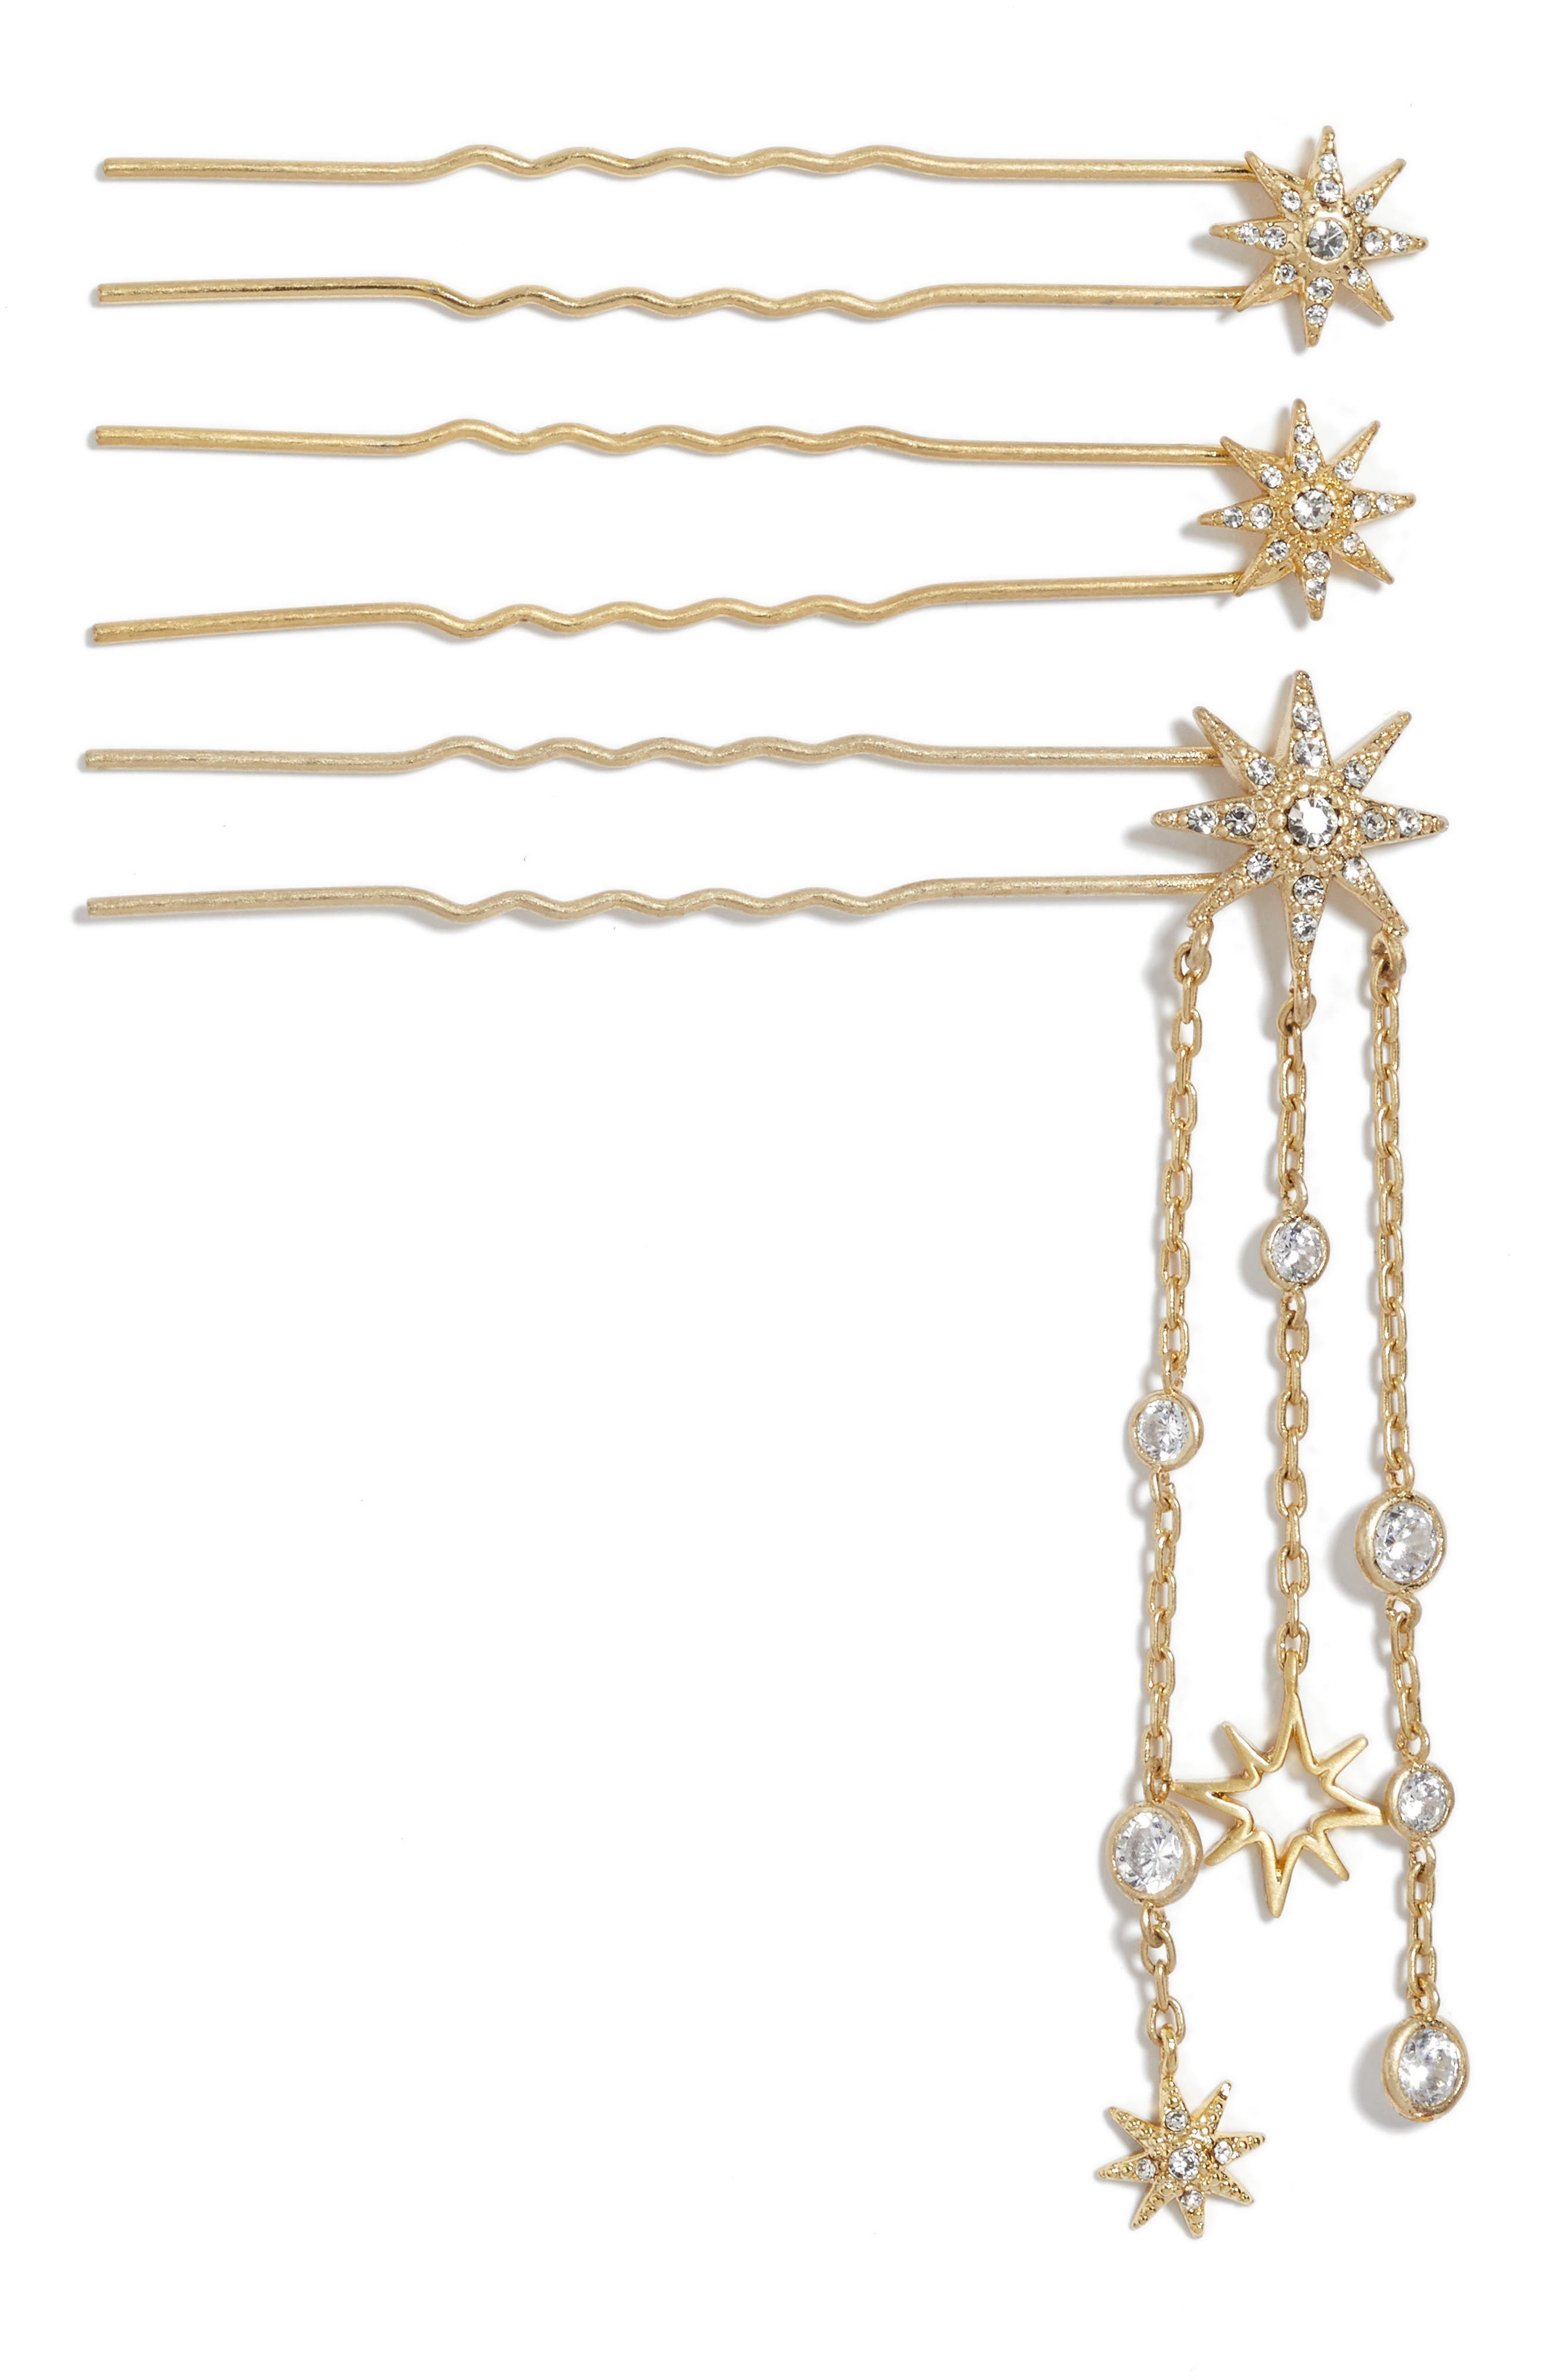 Jenny Packham Set of 3 Hairpins